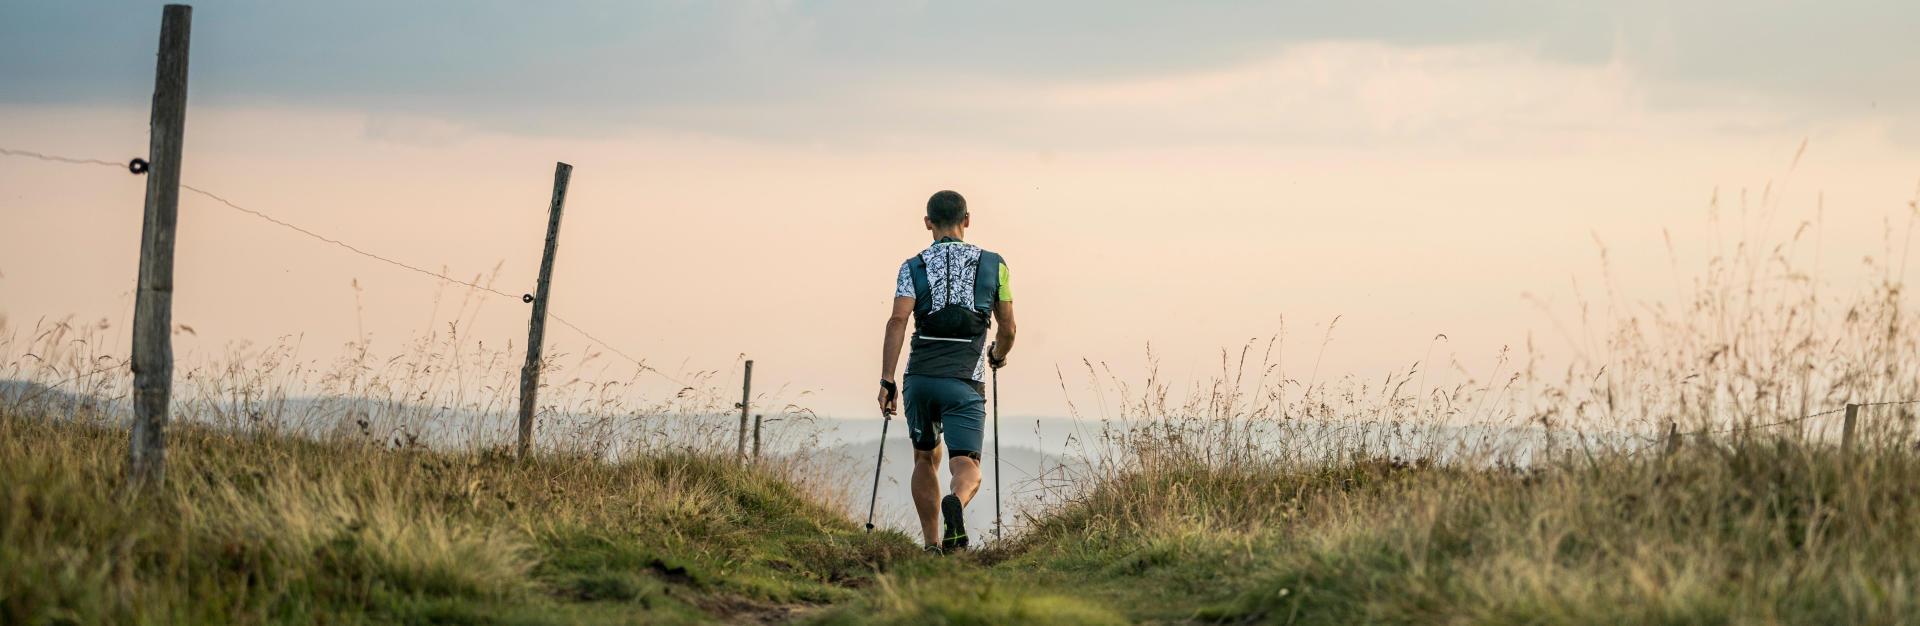 performing-well-in-Nordic-walking